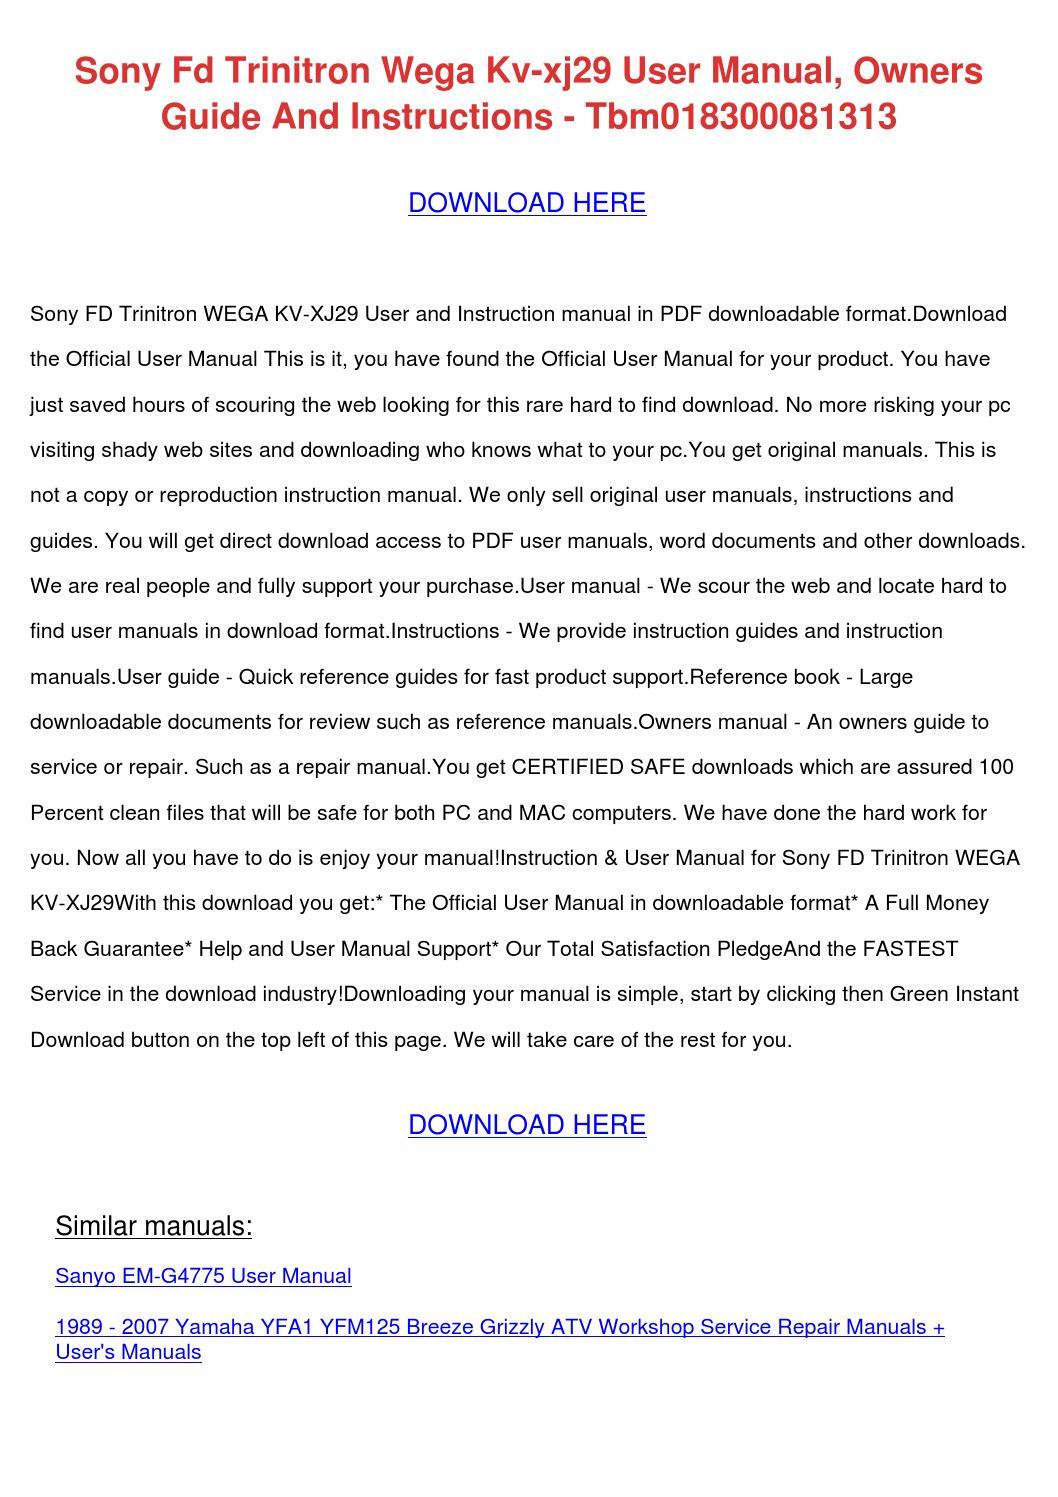 Sony Fd Trinitron Wega Kv Xj29 User Manual Ow by LisaLeblanc - issuu